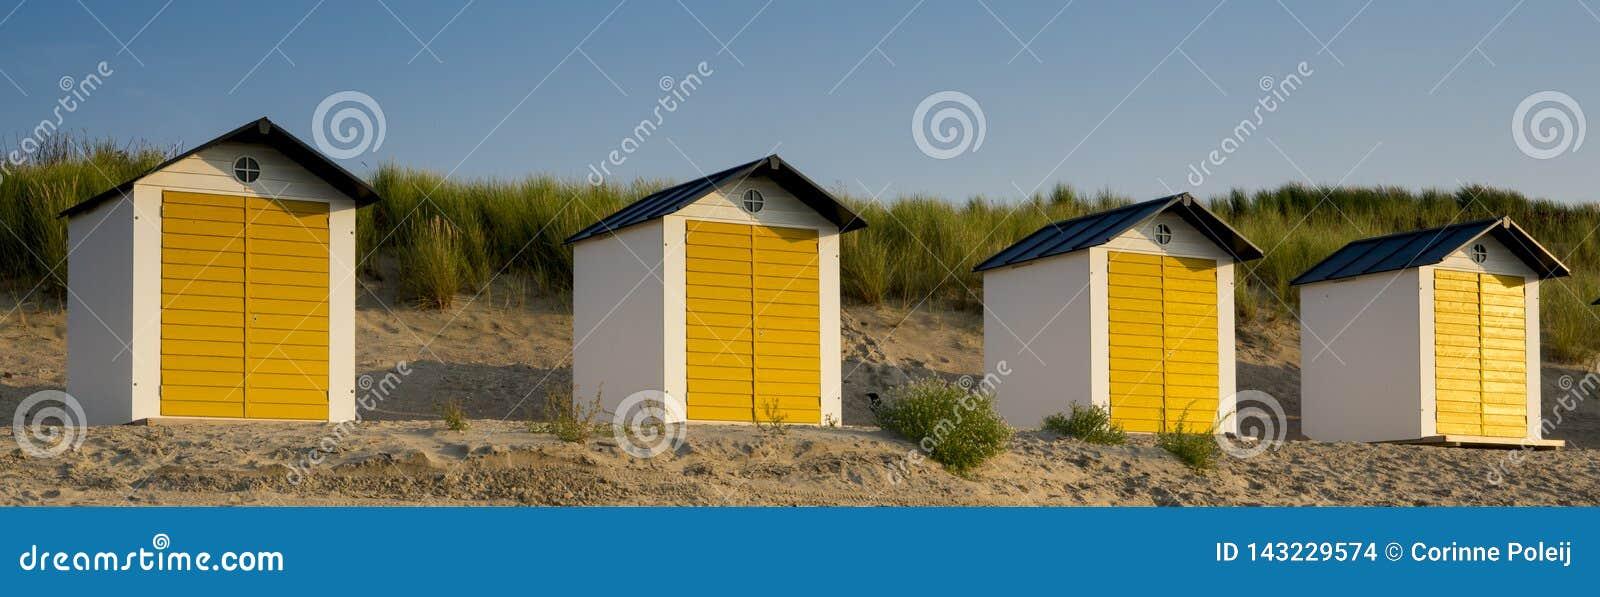 Witte gele strandhuizen in de Slechte duinen van Cadzand, Nederland